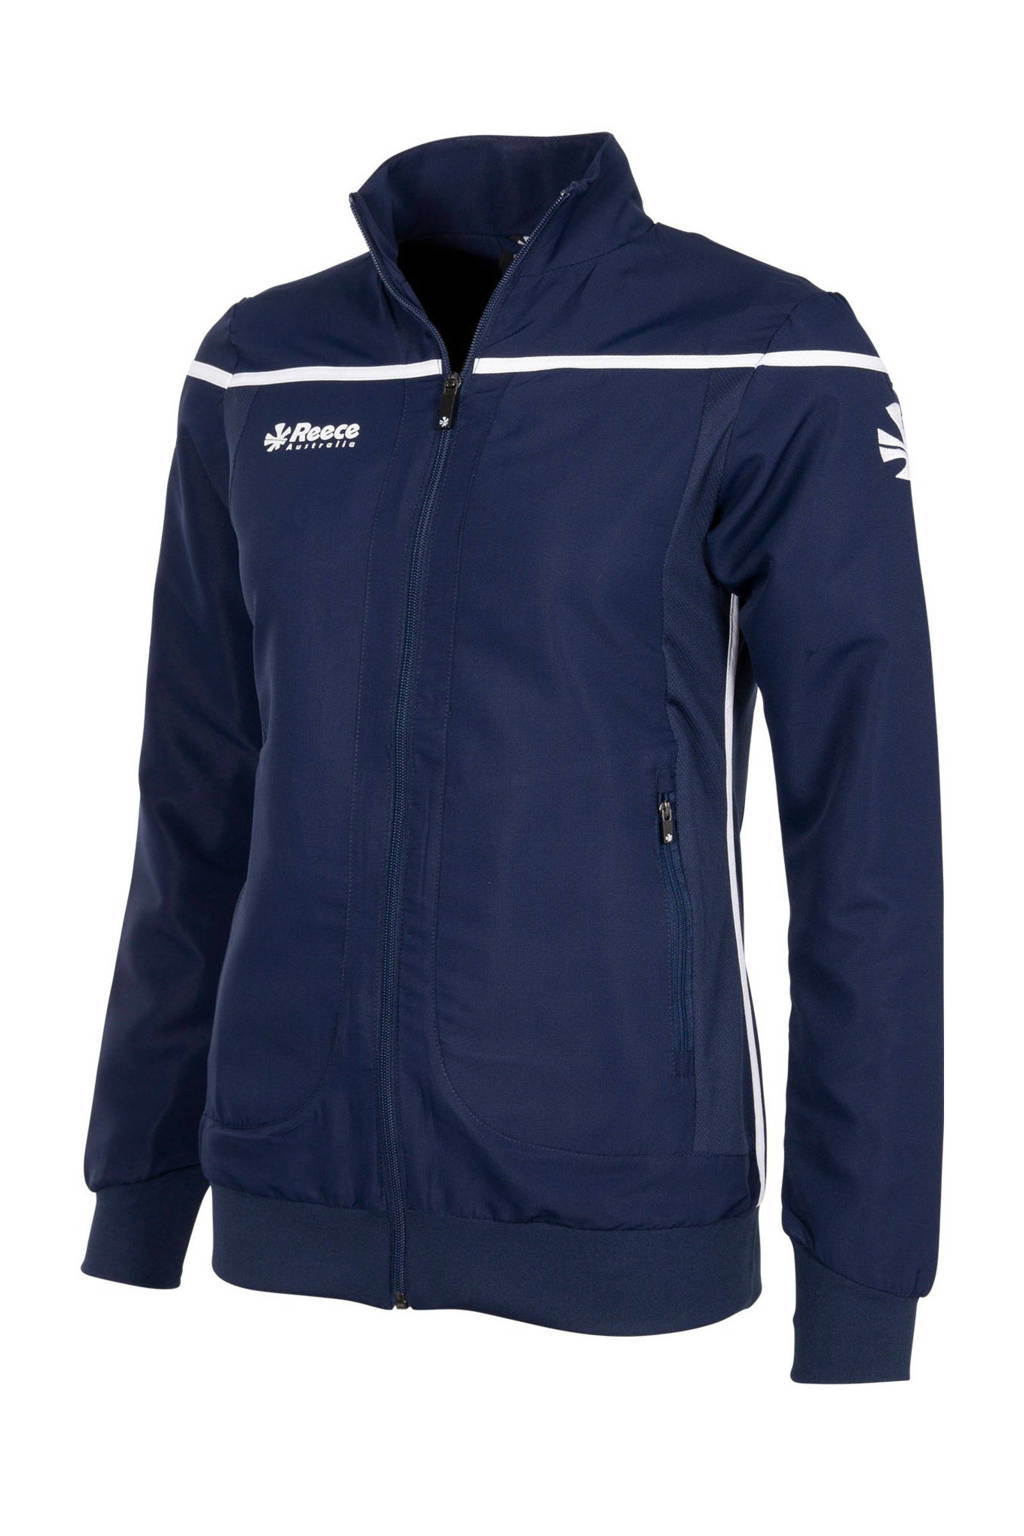 Reece Australia sportvest Varsity donkerblauw, Donkerblauw